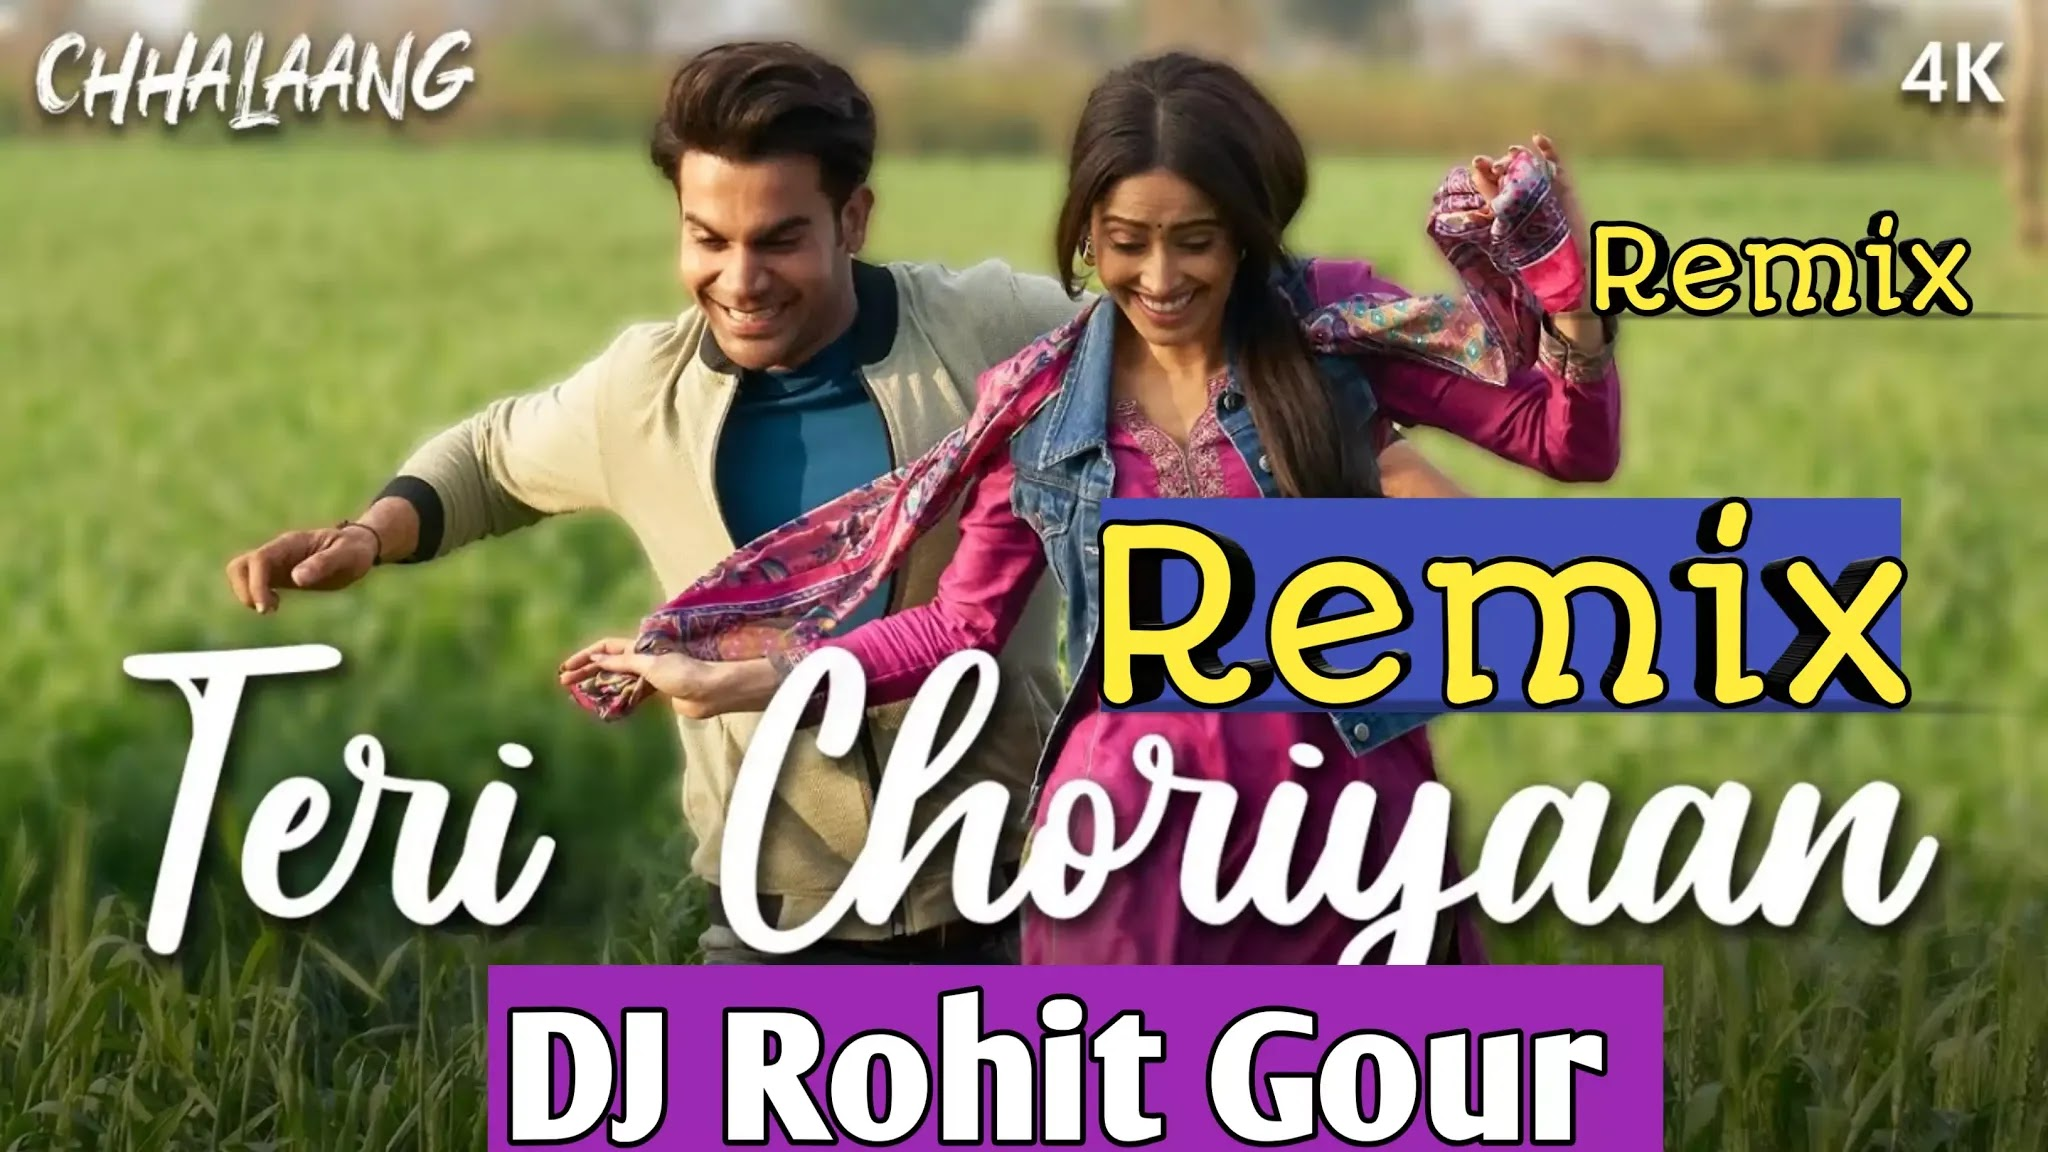 Teri Choriyaan Dj Remix Song (Chhalaang) Guru Randhawa Full Mp3 Song Download